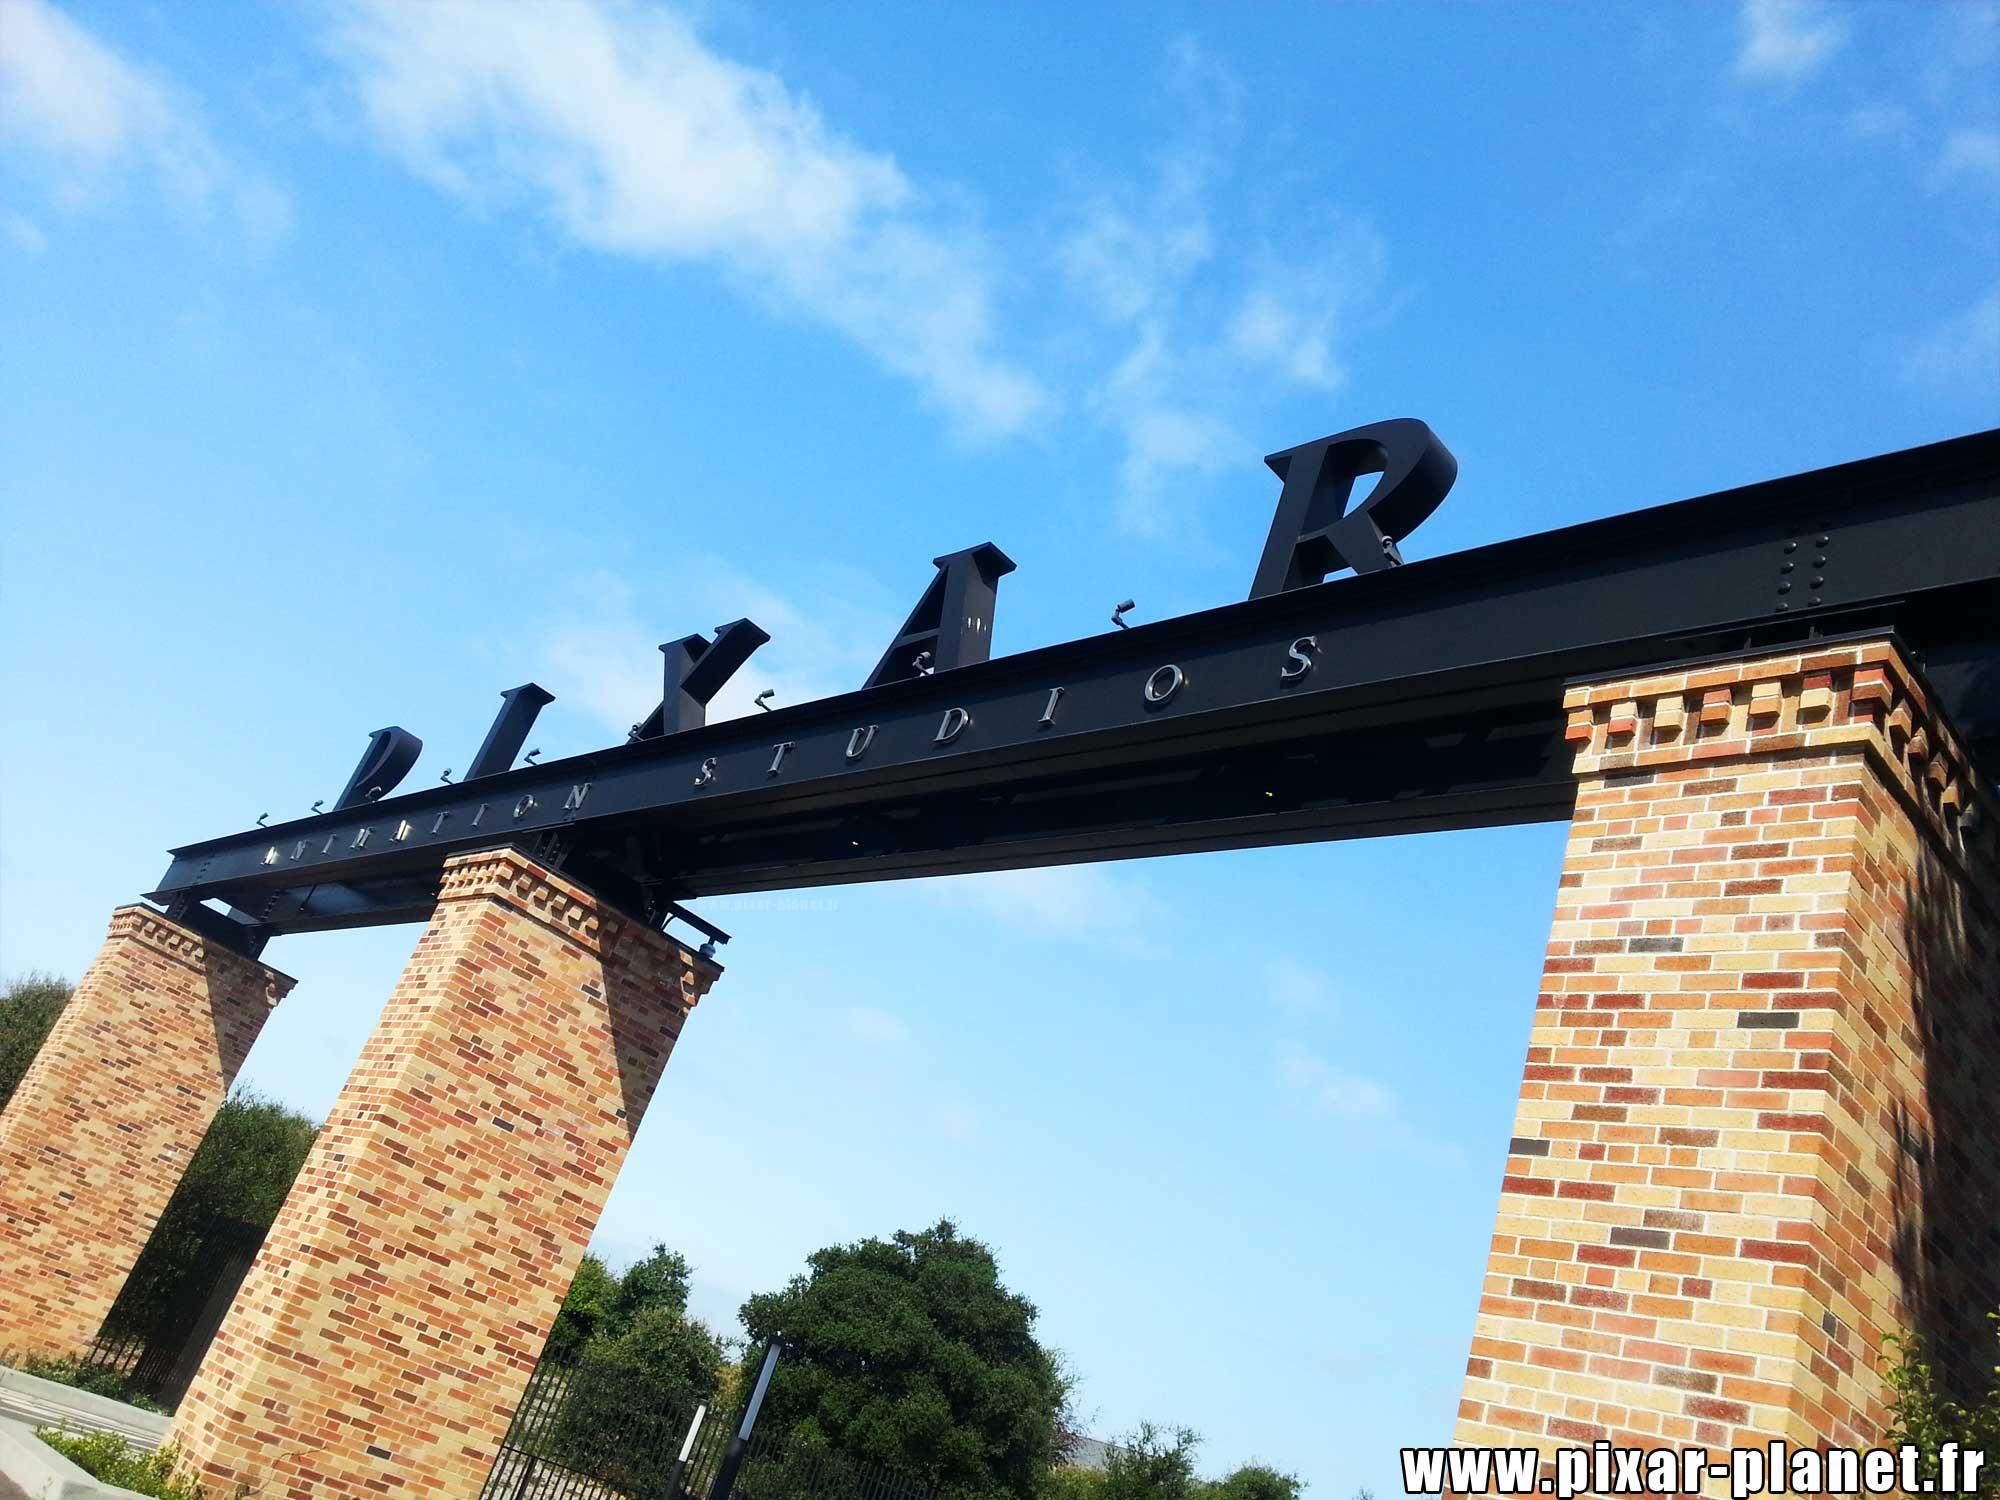 Pixar Planet Disney studios